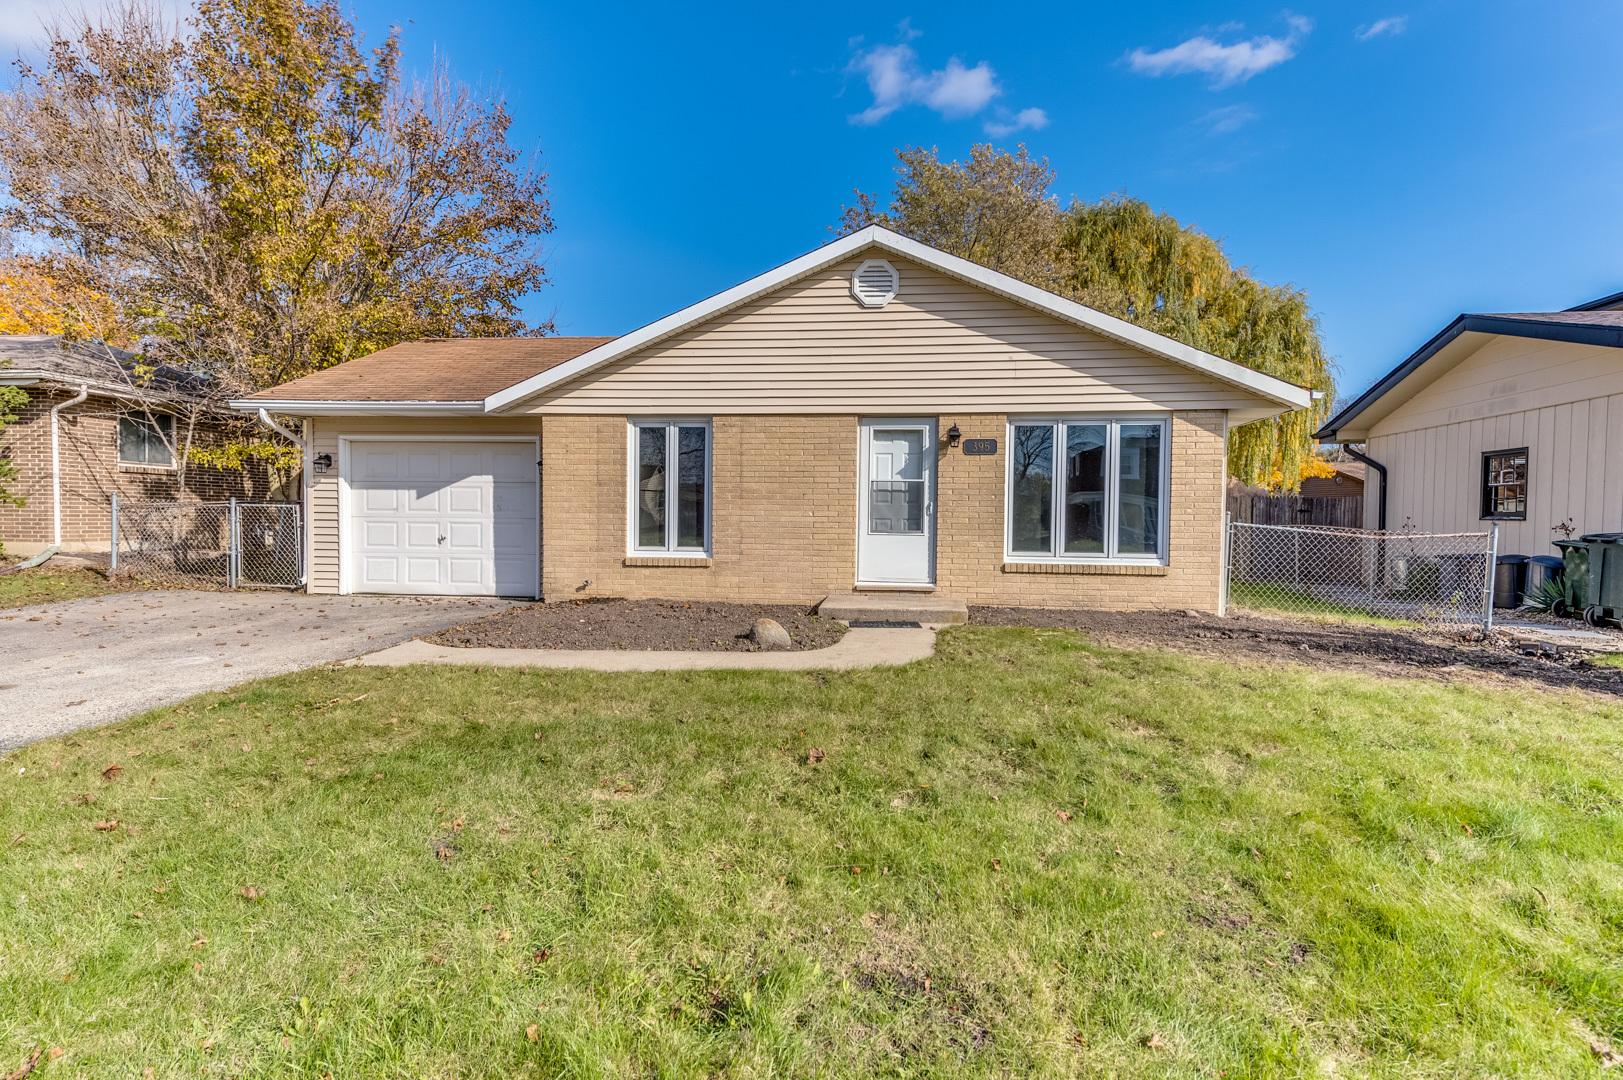 395 Northgate Road, Lindenhurst, Illinois 60046